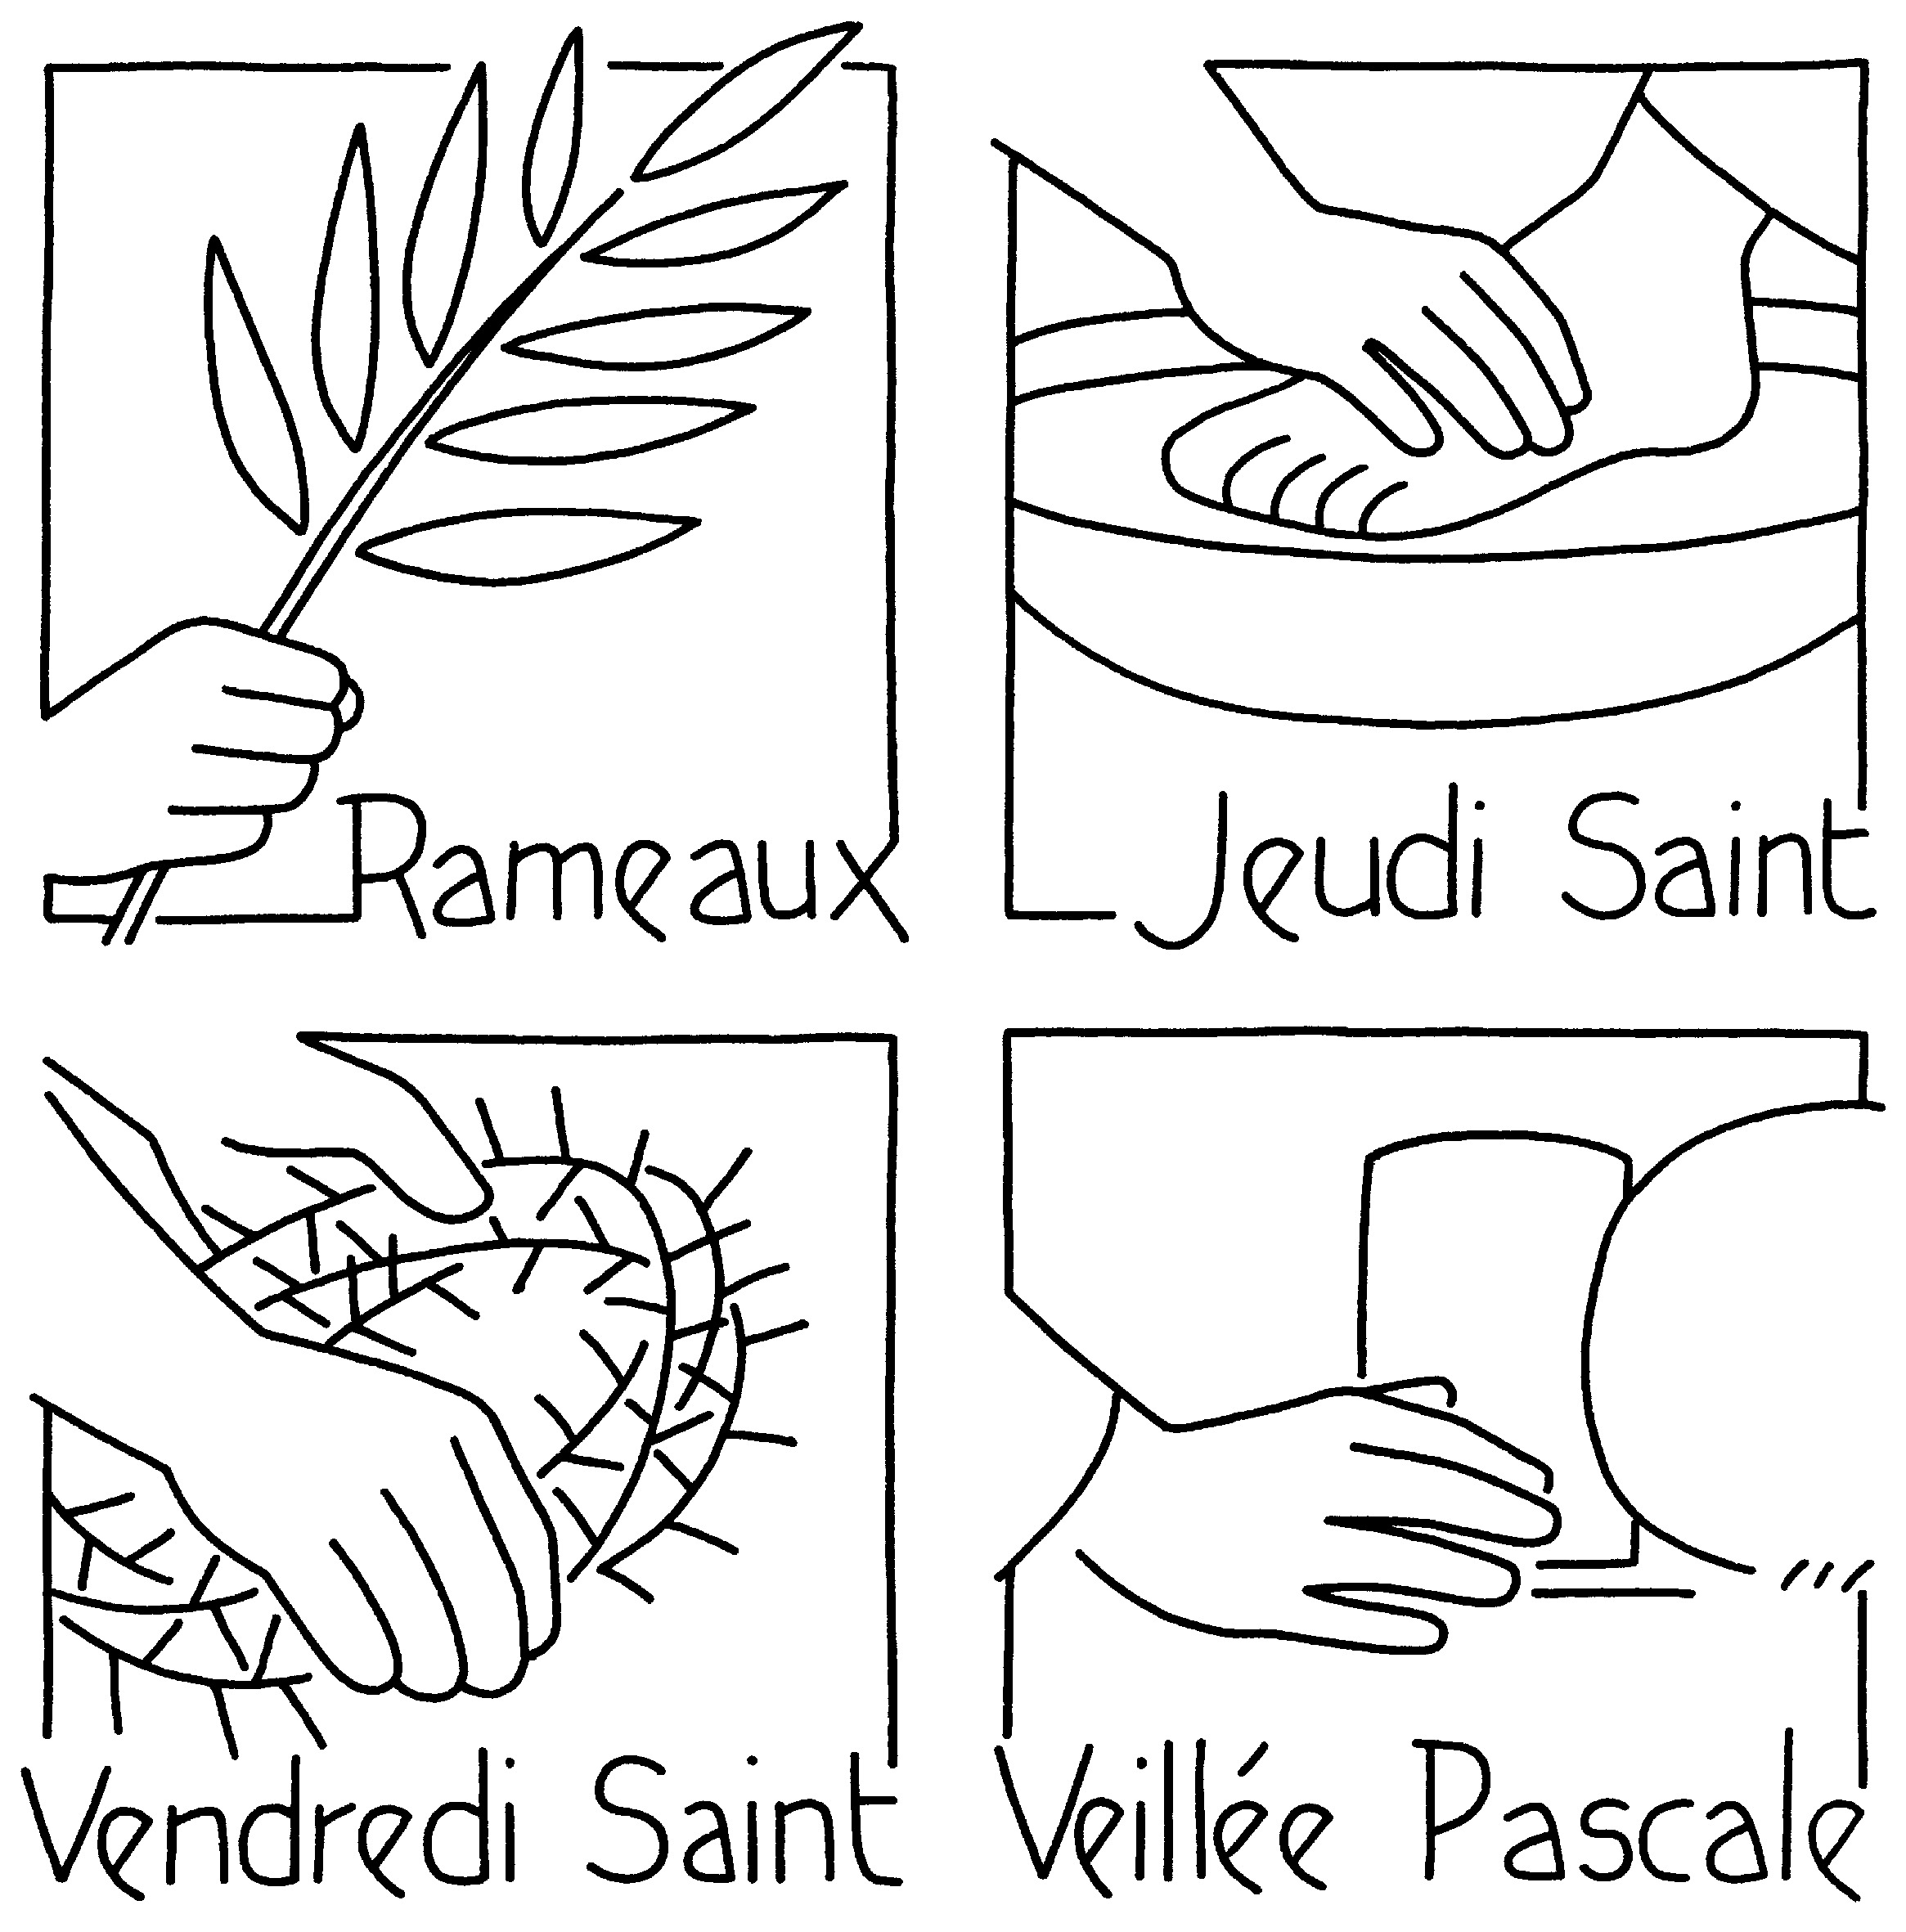 Semaine Sainte copyright Jean-François KIEFFER